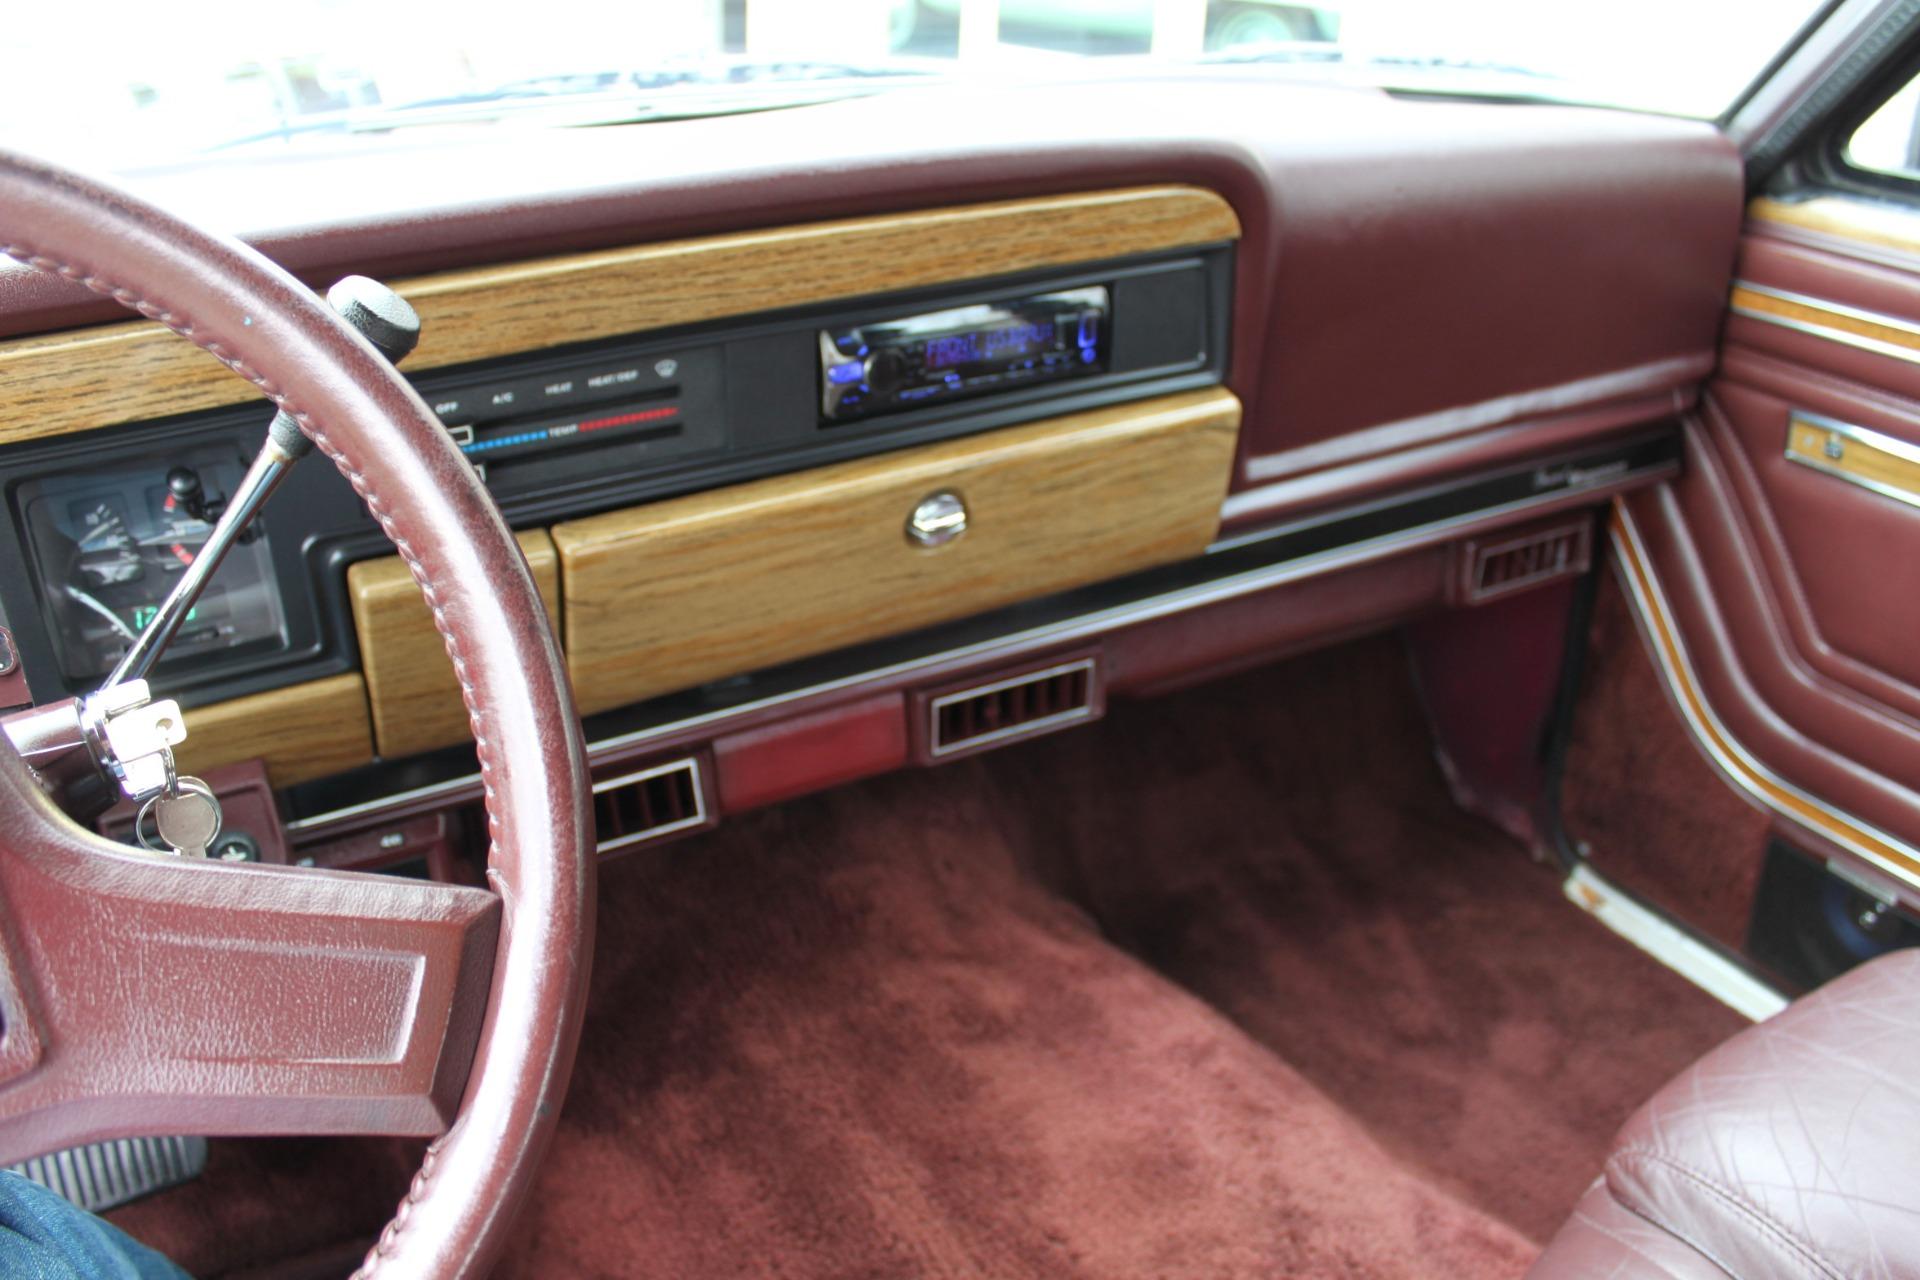 Used-1989-Jeep-Grand-Wagoneer-Lincoln